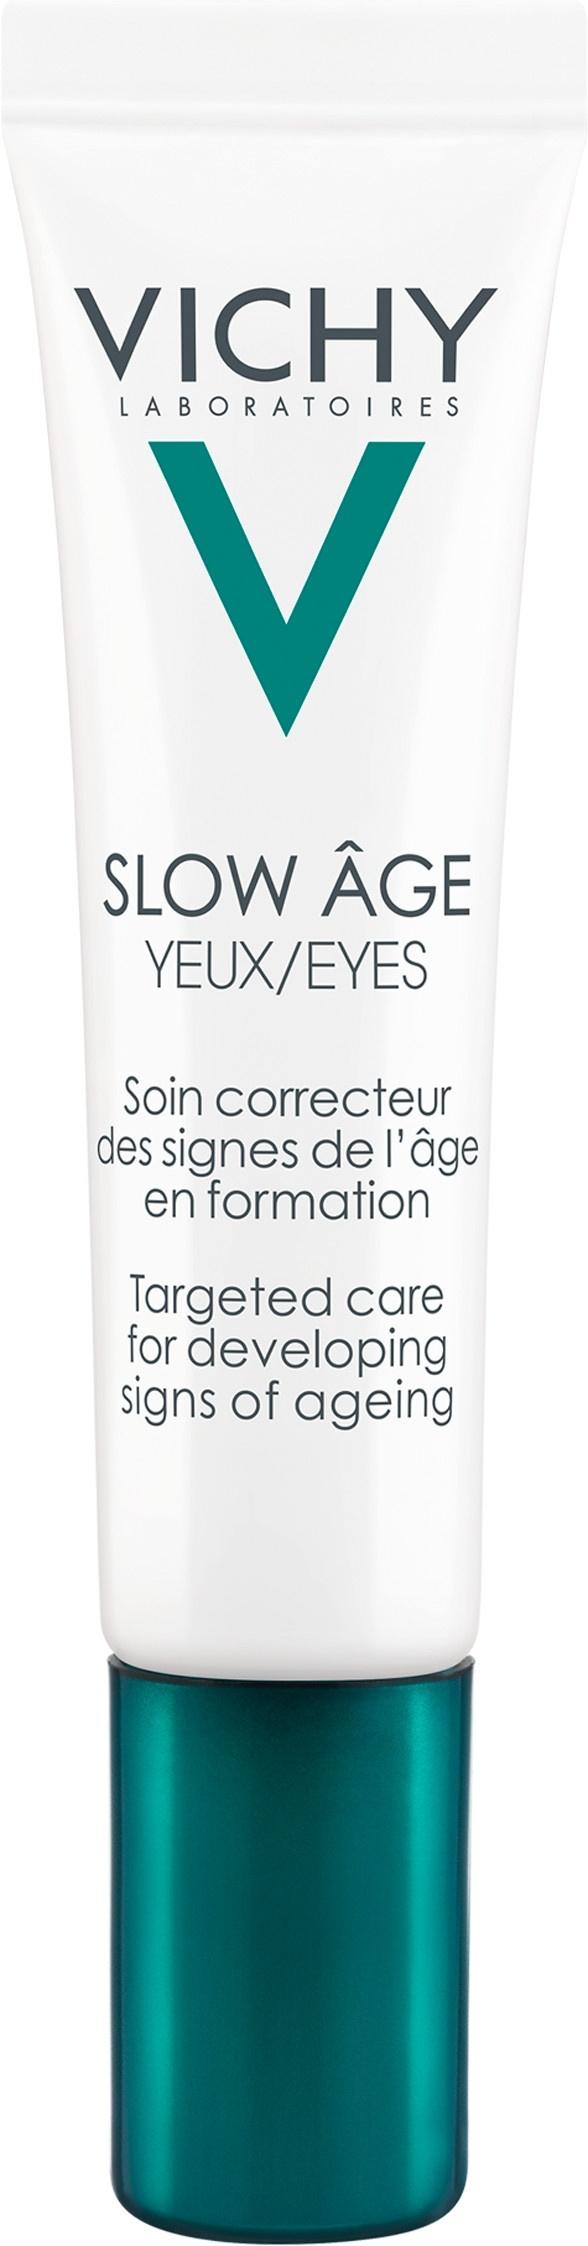 Vichy Slow Age Eye Corrective Care Cream 15ml